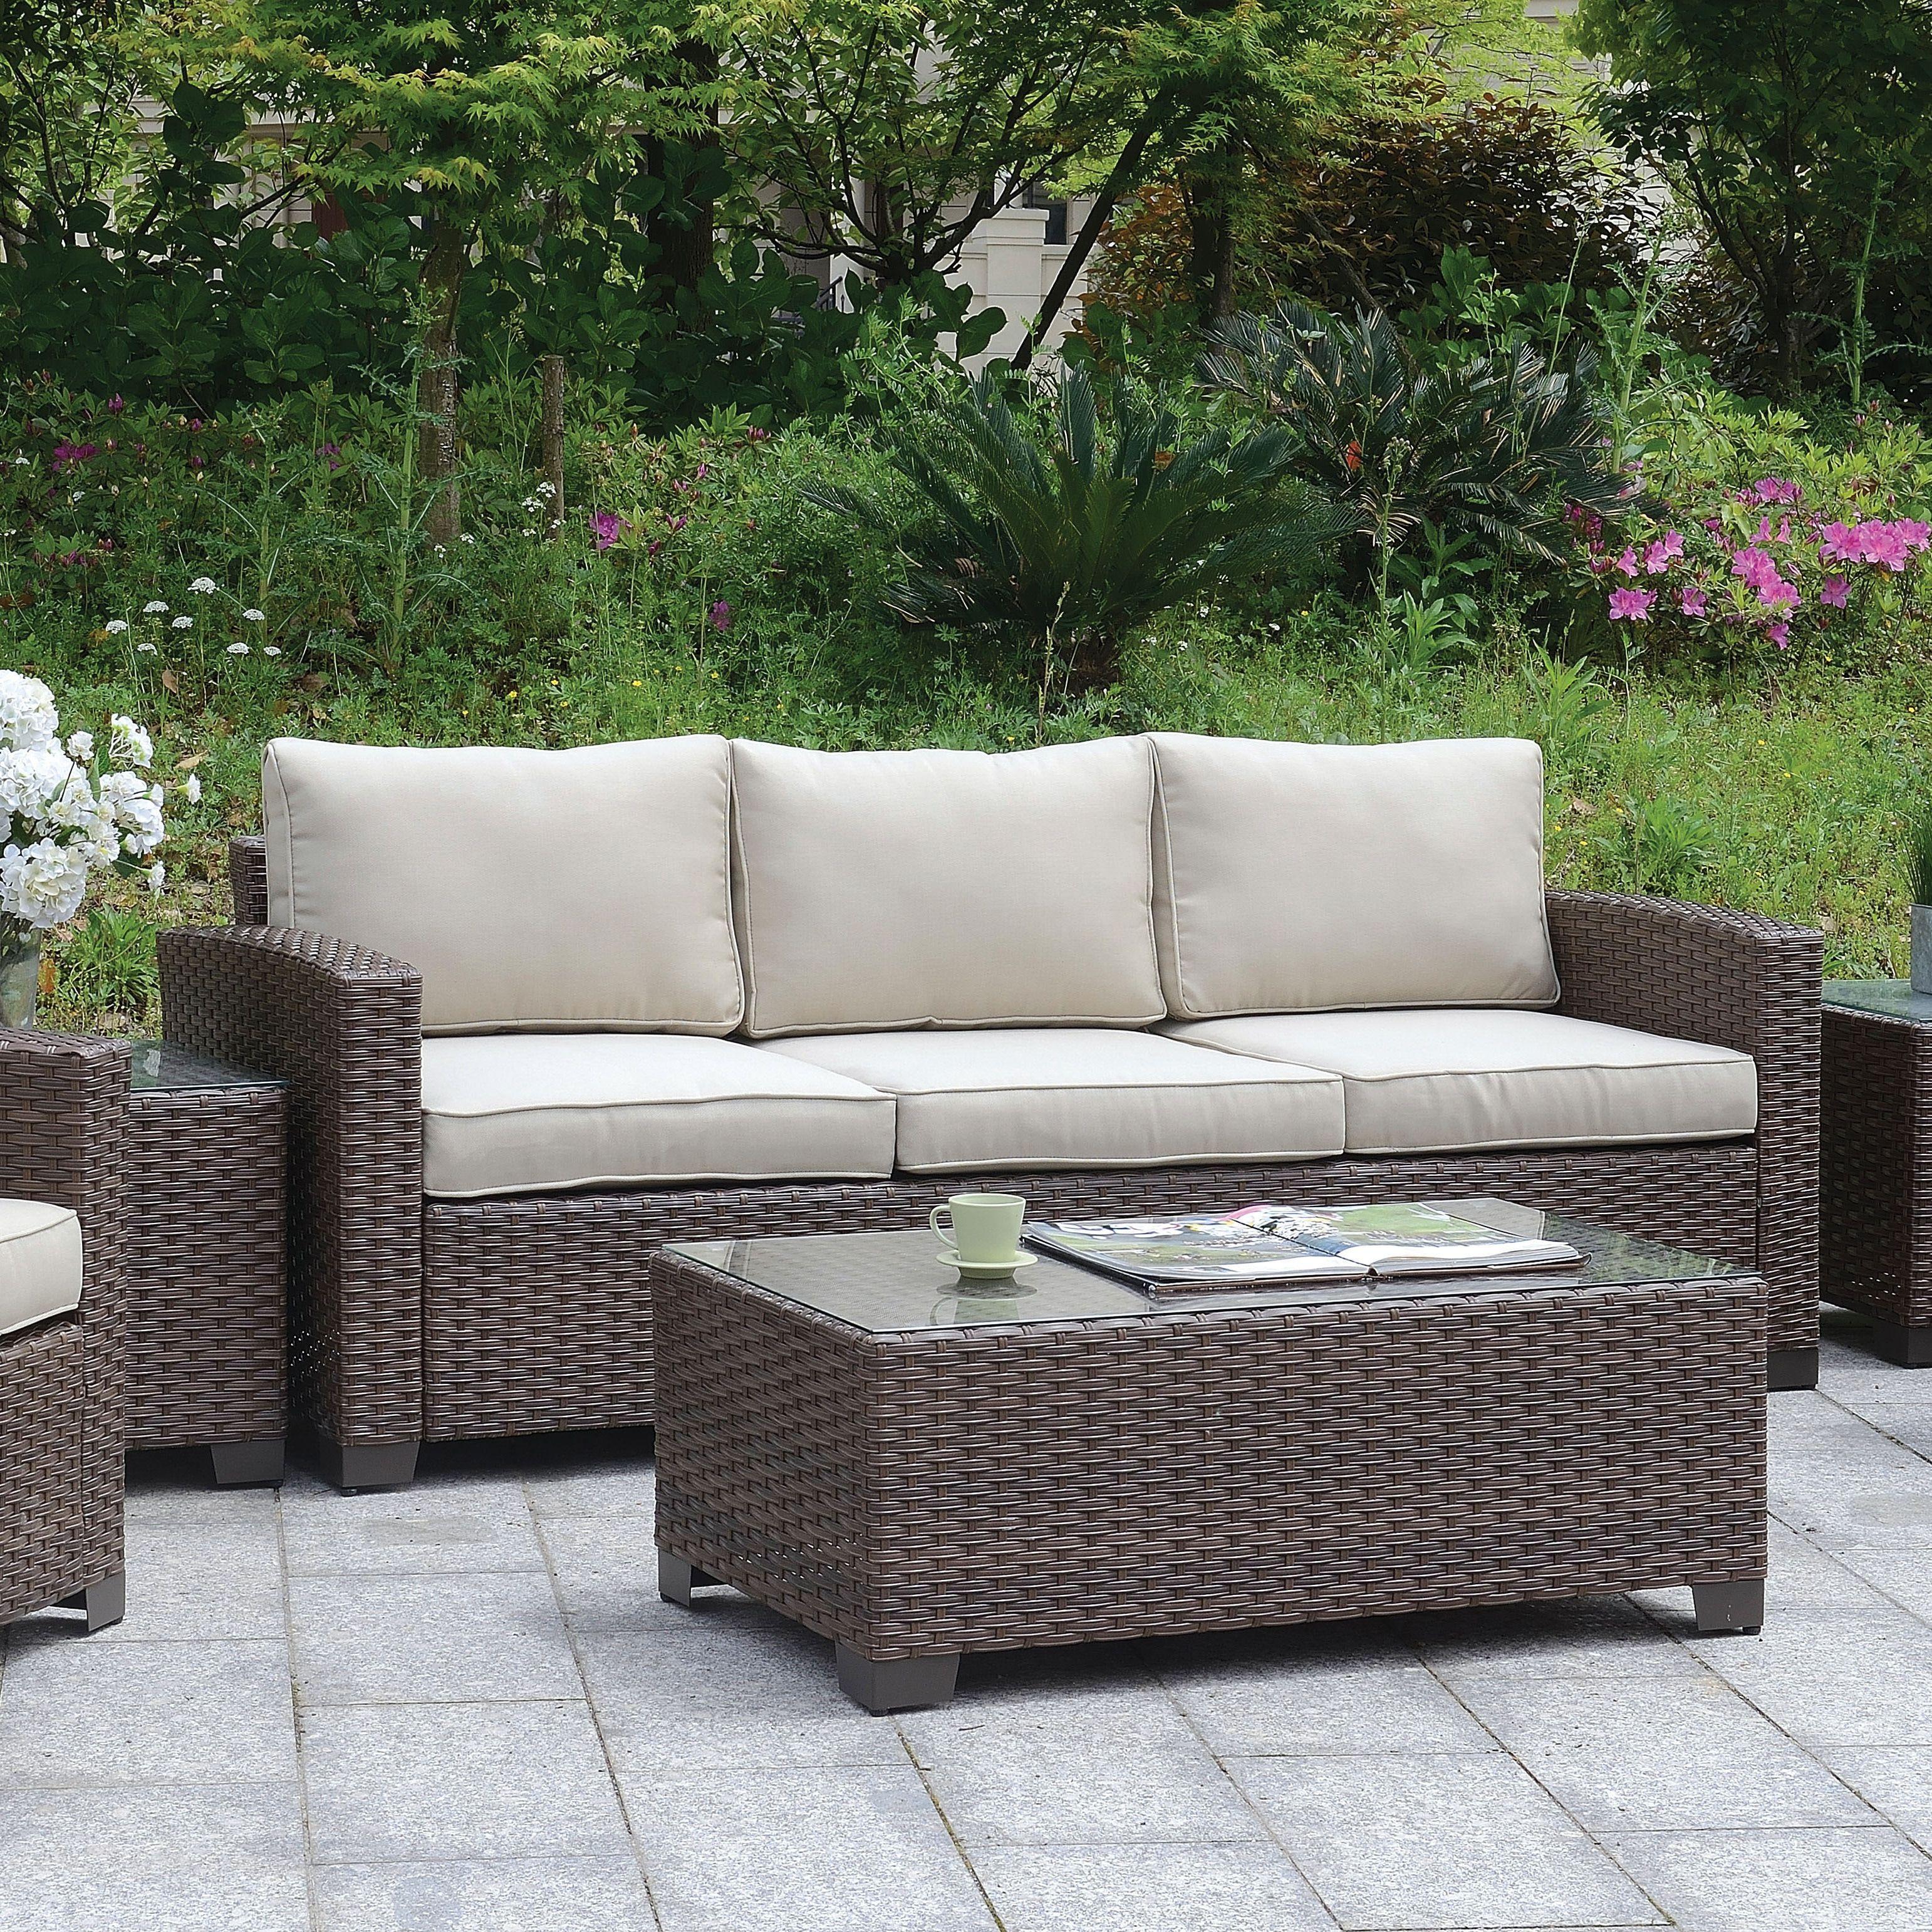 Furniture Of America Bryon Contemporary Wicker Like Sofa Brown Beige Size Single Patio Aluminum